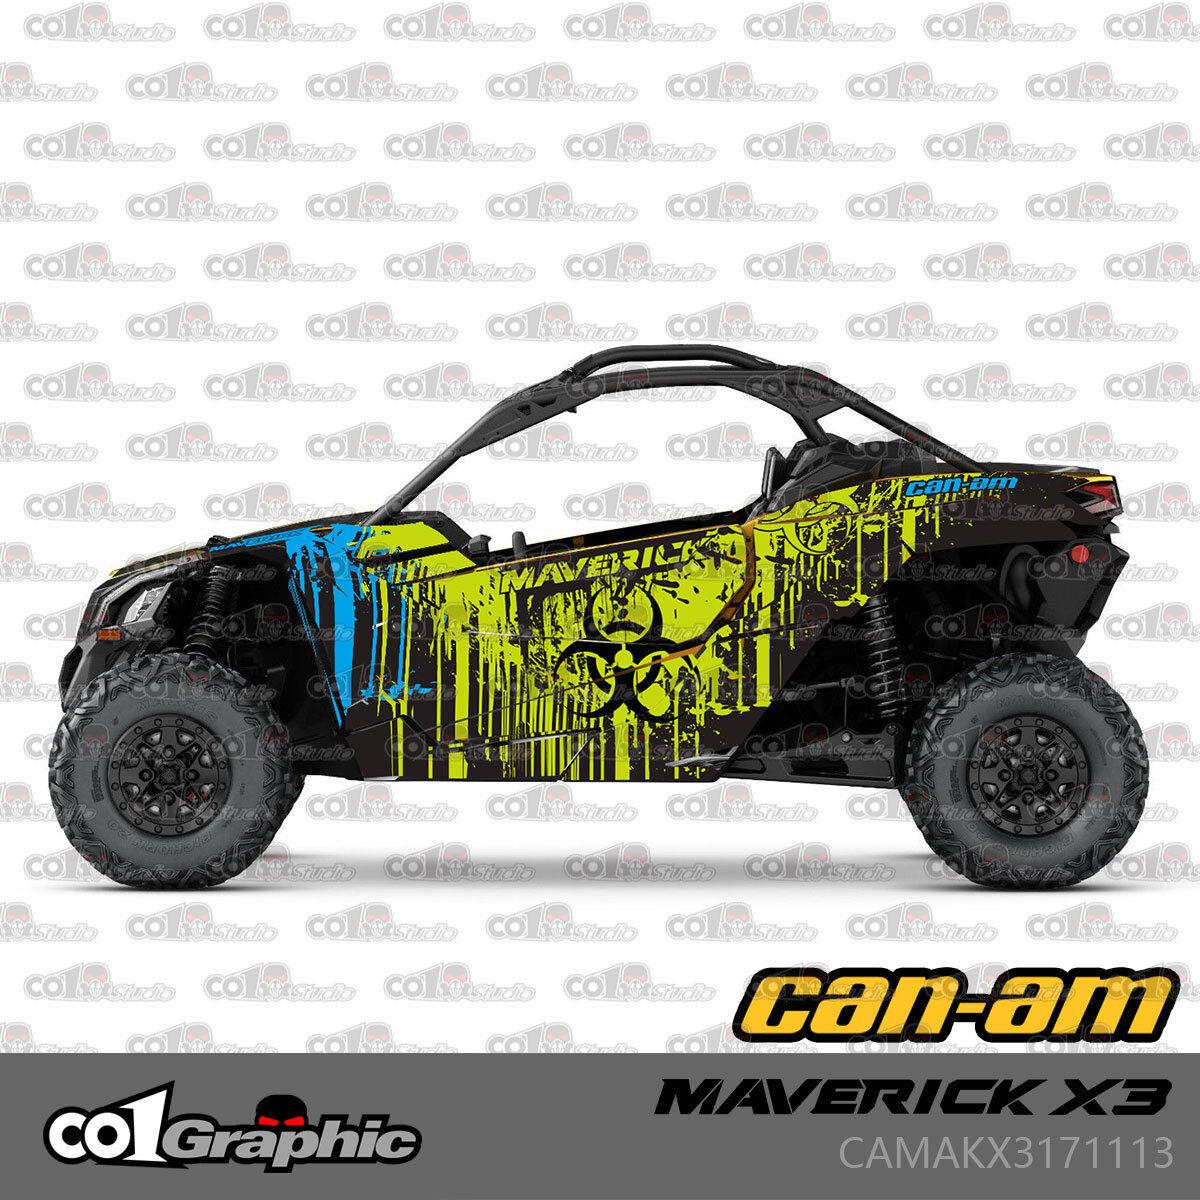 SIKSPAK Can Am Maverick X3 Full Graphic Kit Wrap Sticker Parts 2016 REBIRTH U